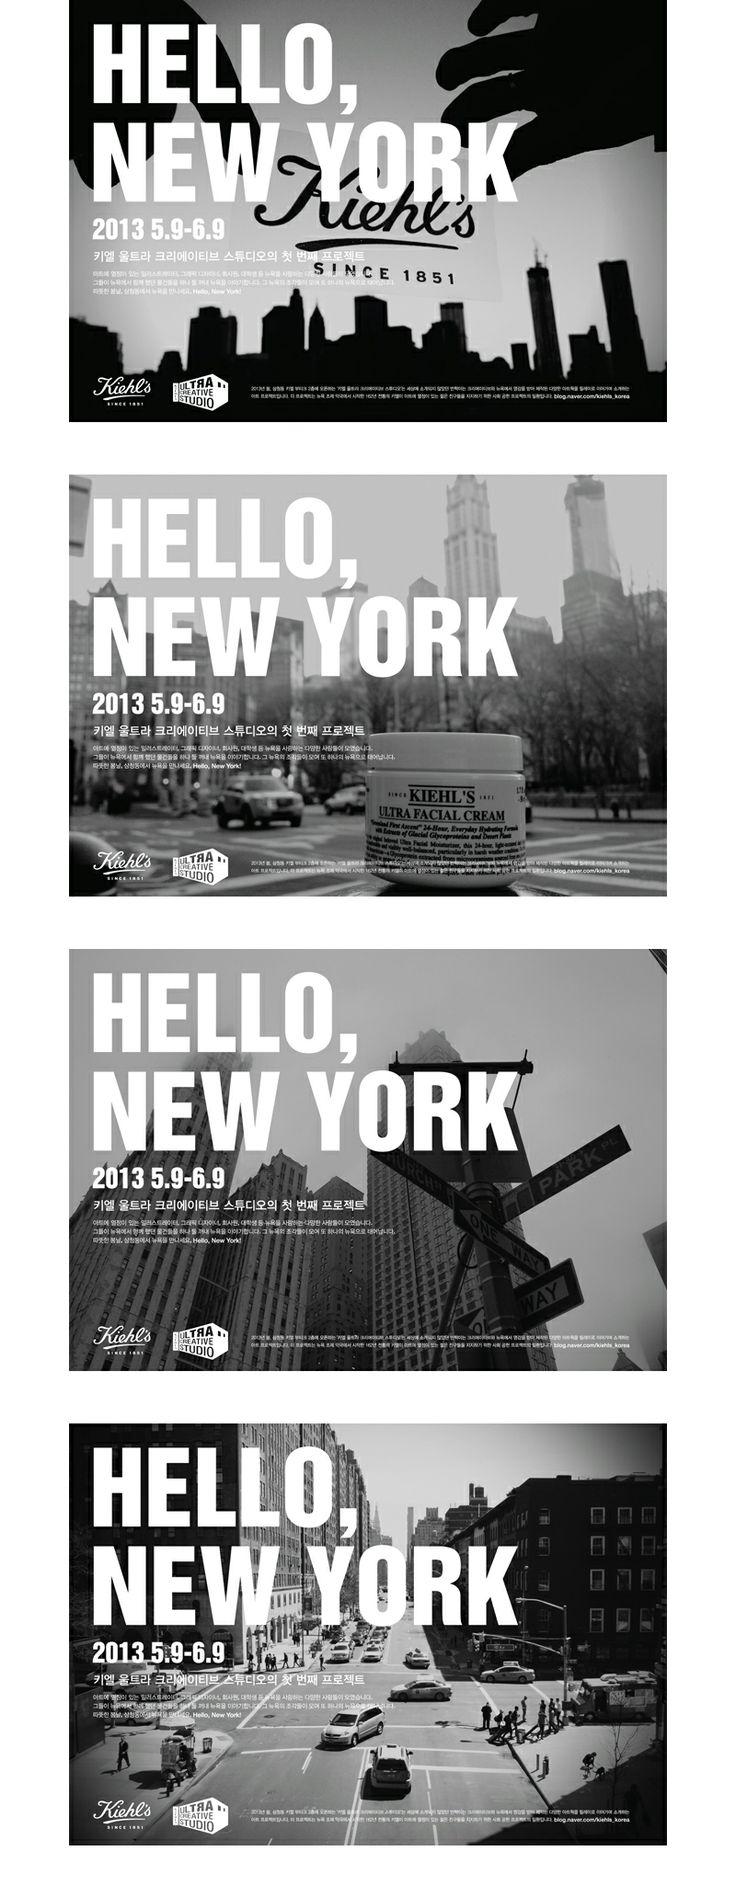 kiehl's ultra studio. hello, newyork